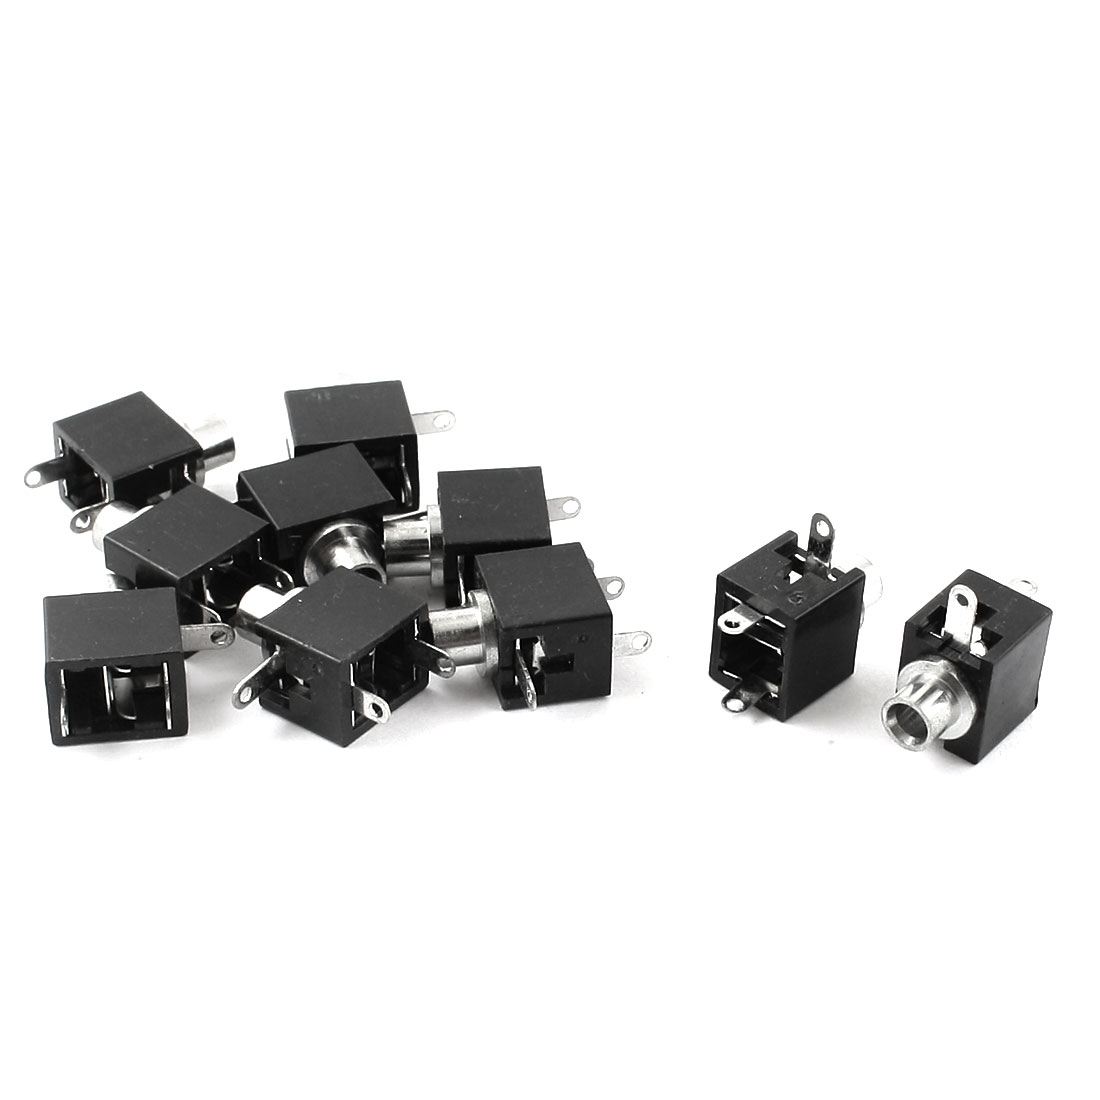 10Pcs 3 Terminal 3mm Female Audio Jacks Socket for Headset Earphone